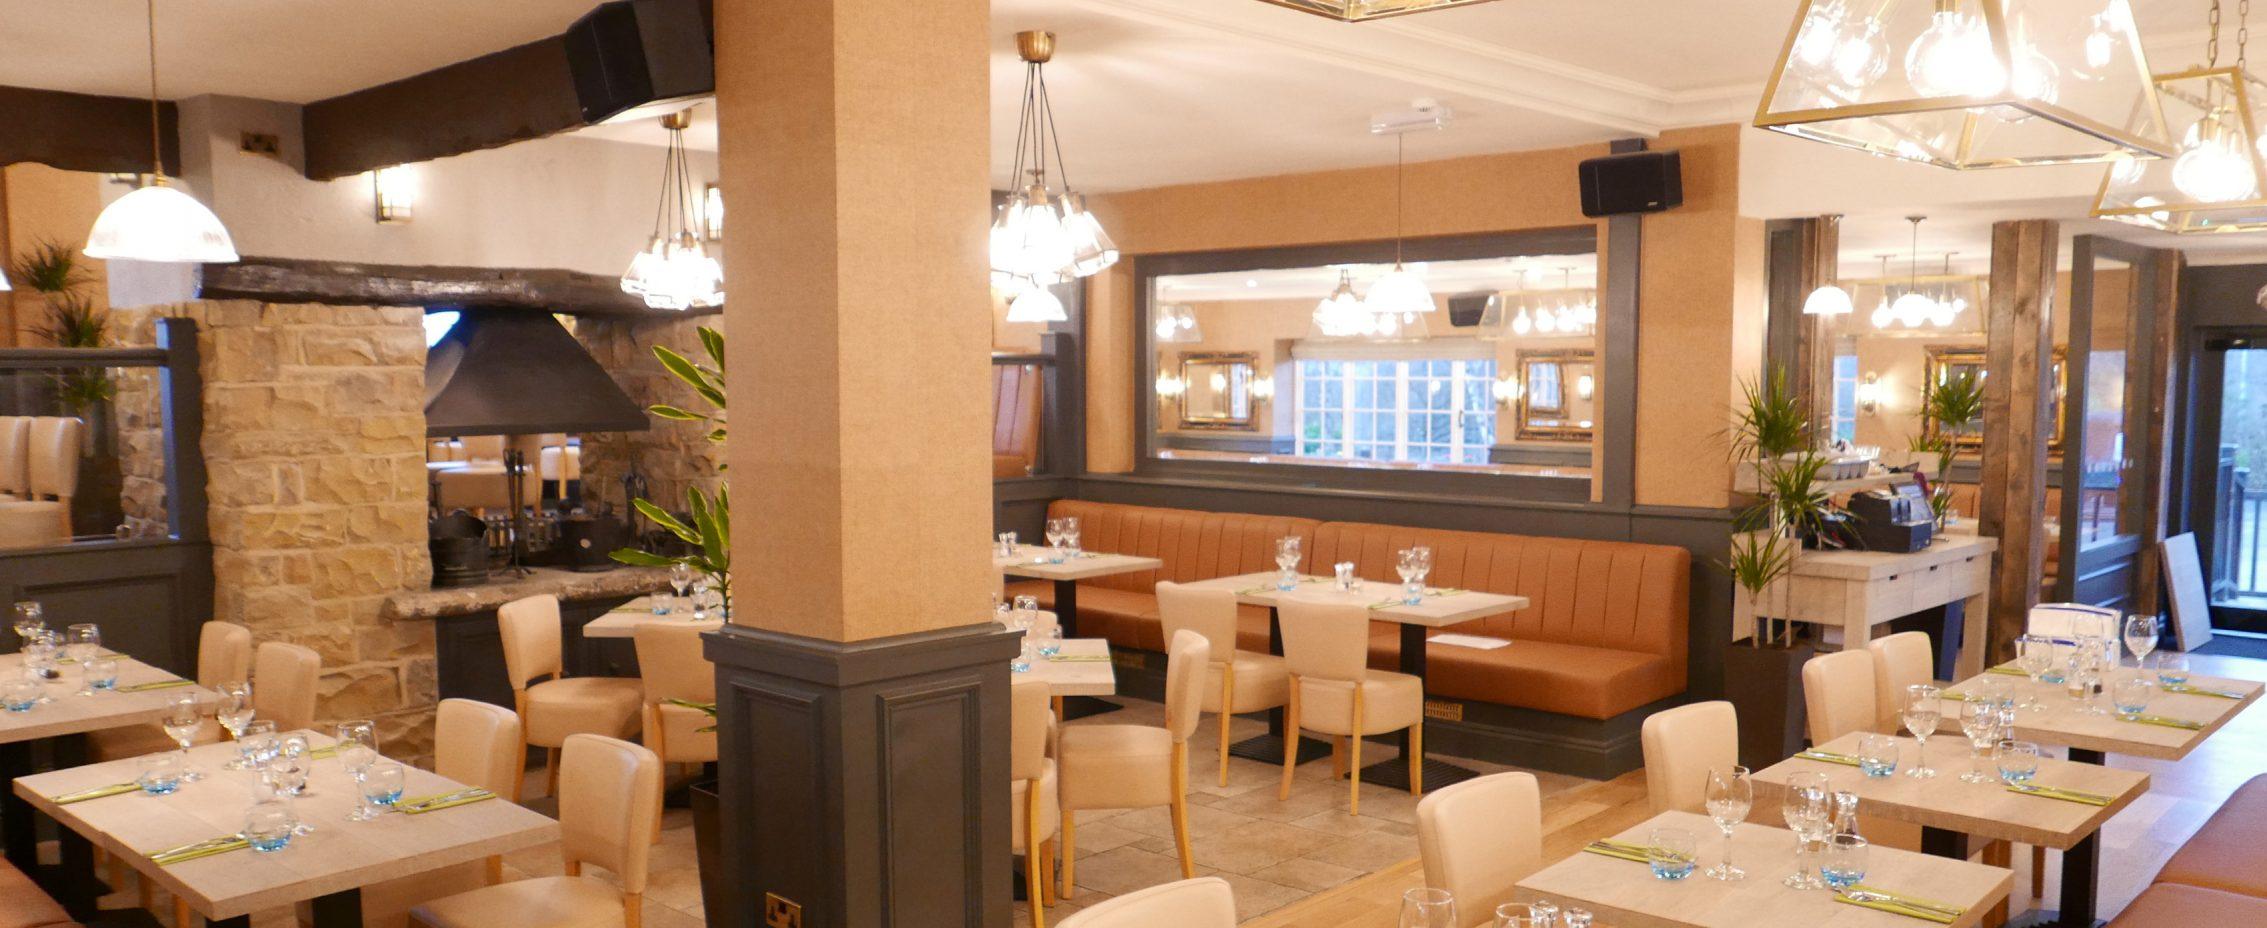 Ego Mediterranean Restaurant Horbury